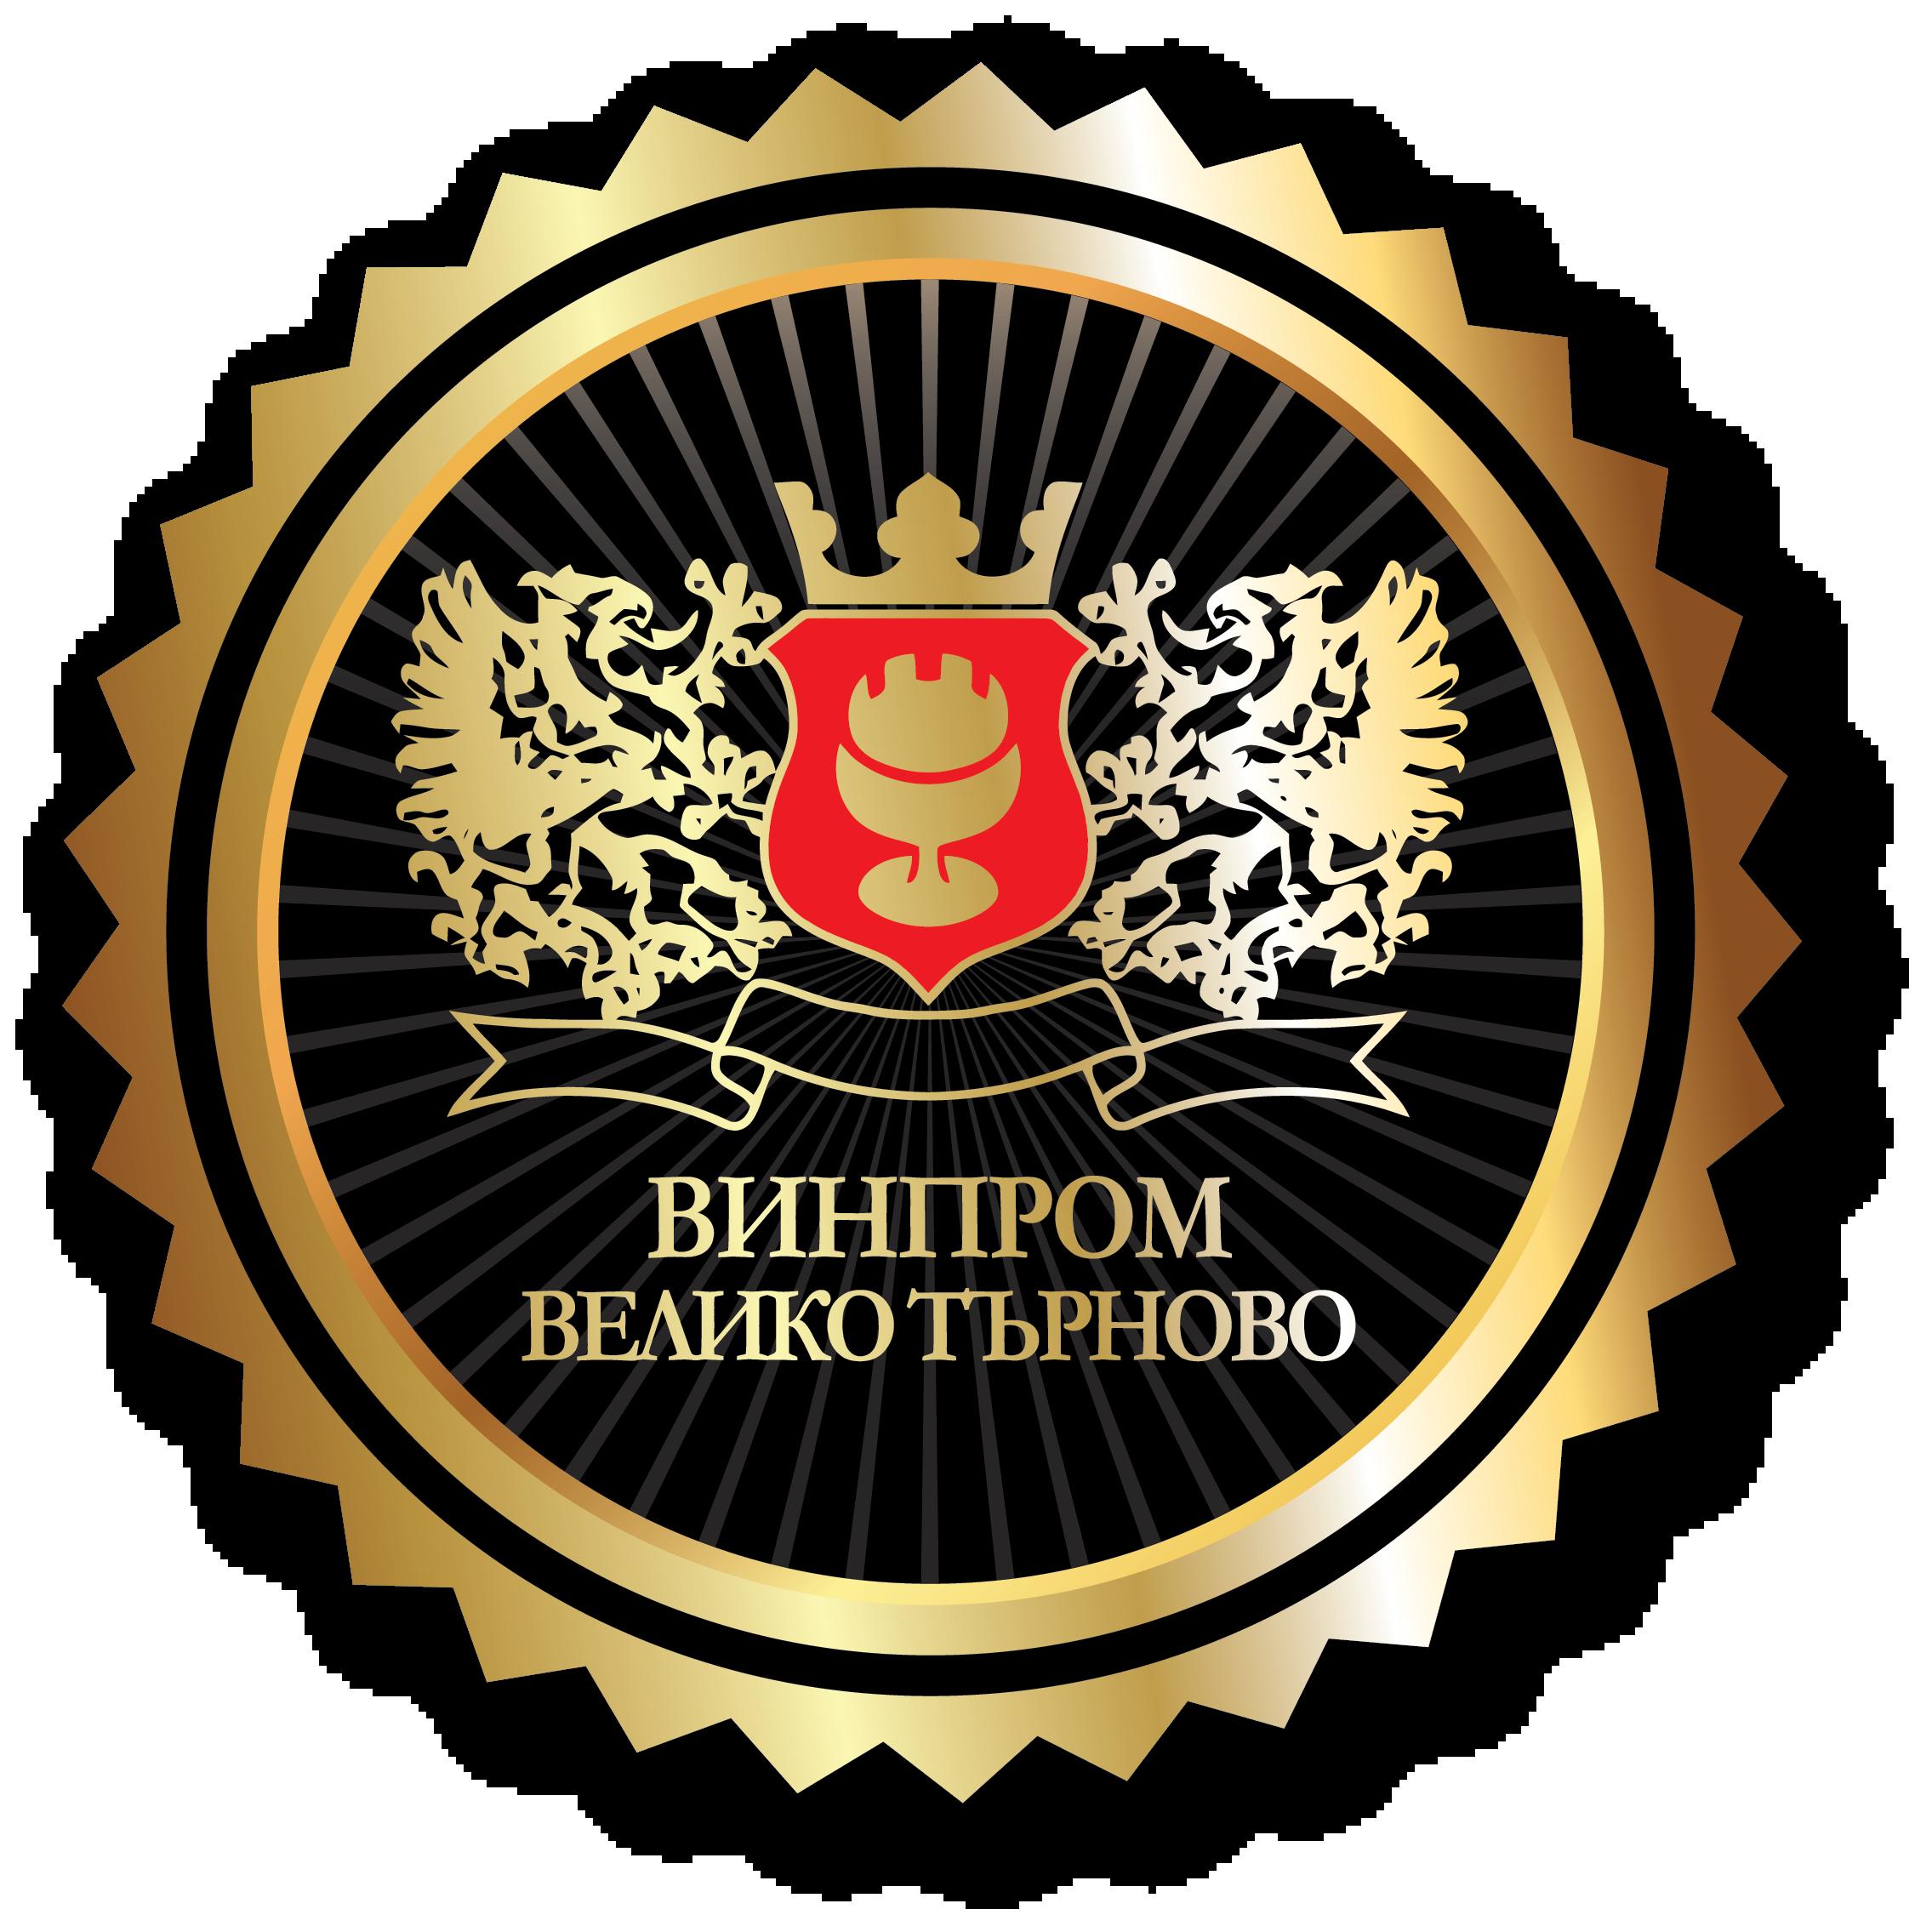 Винпром АД Велико Търново, лого, лого винпром ад велико търново